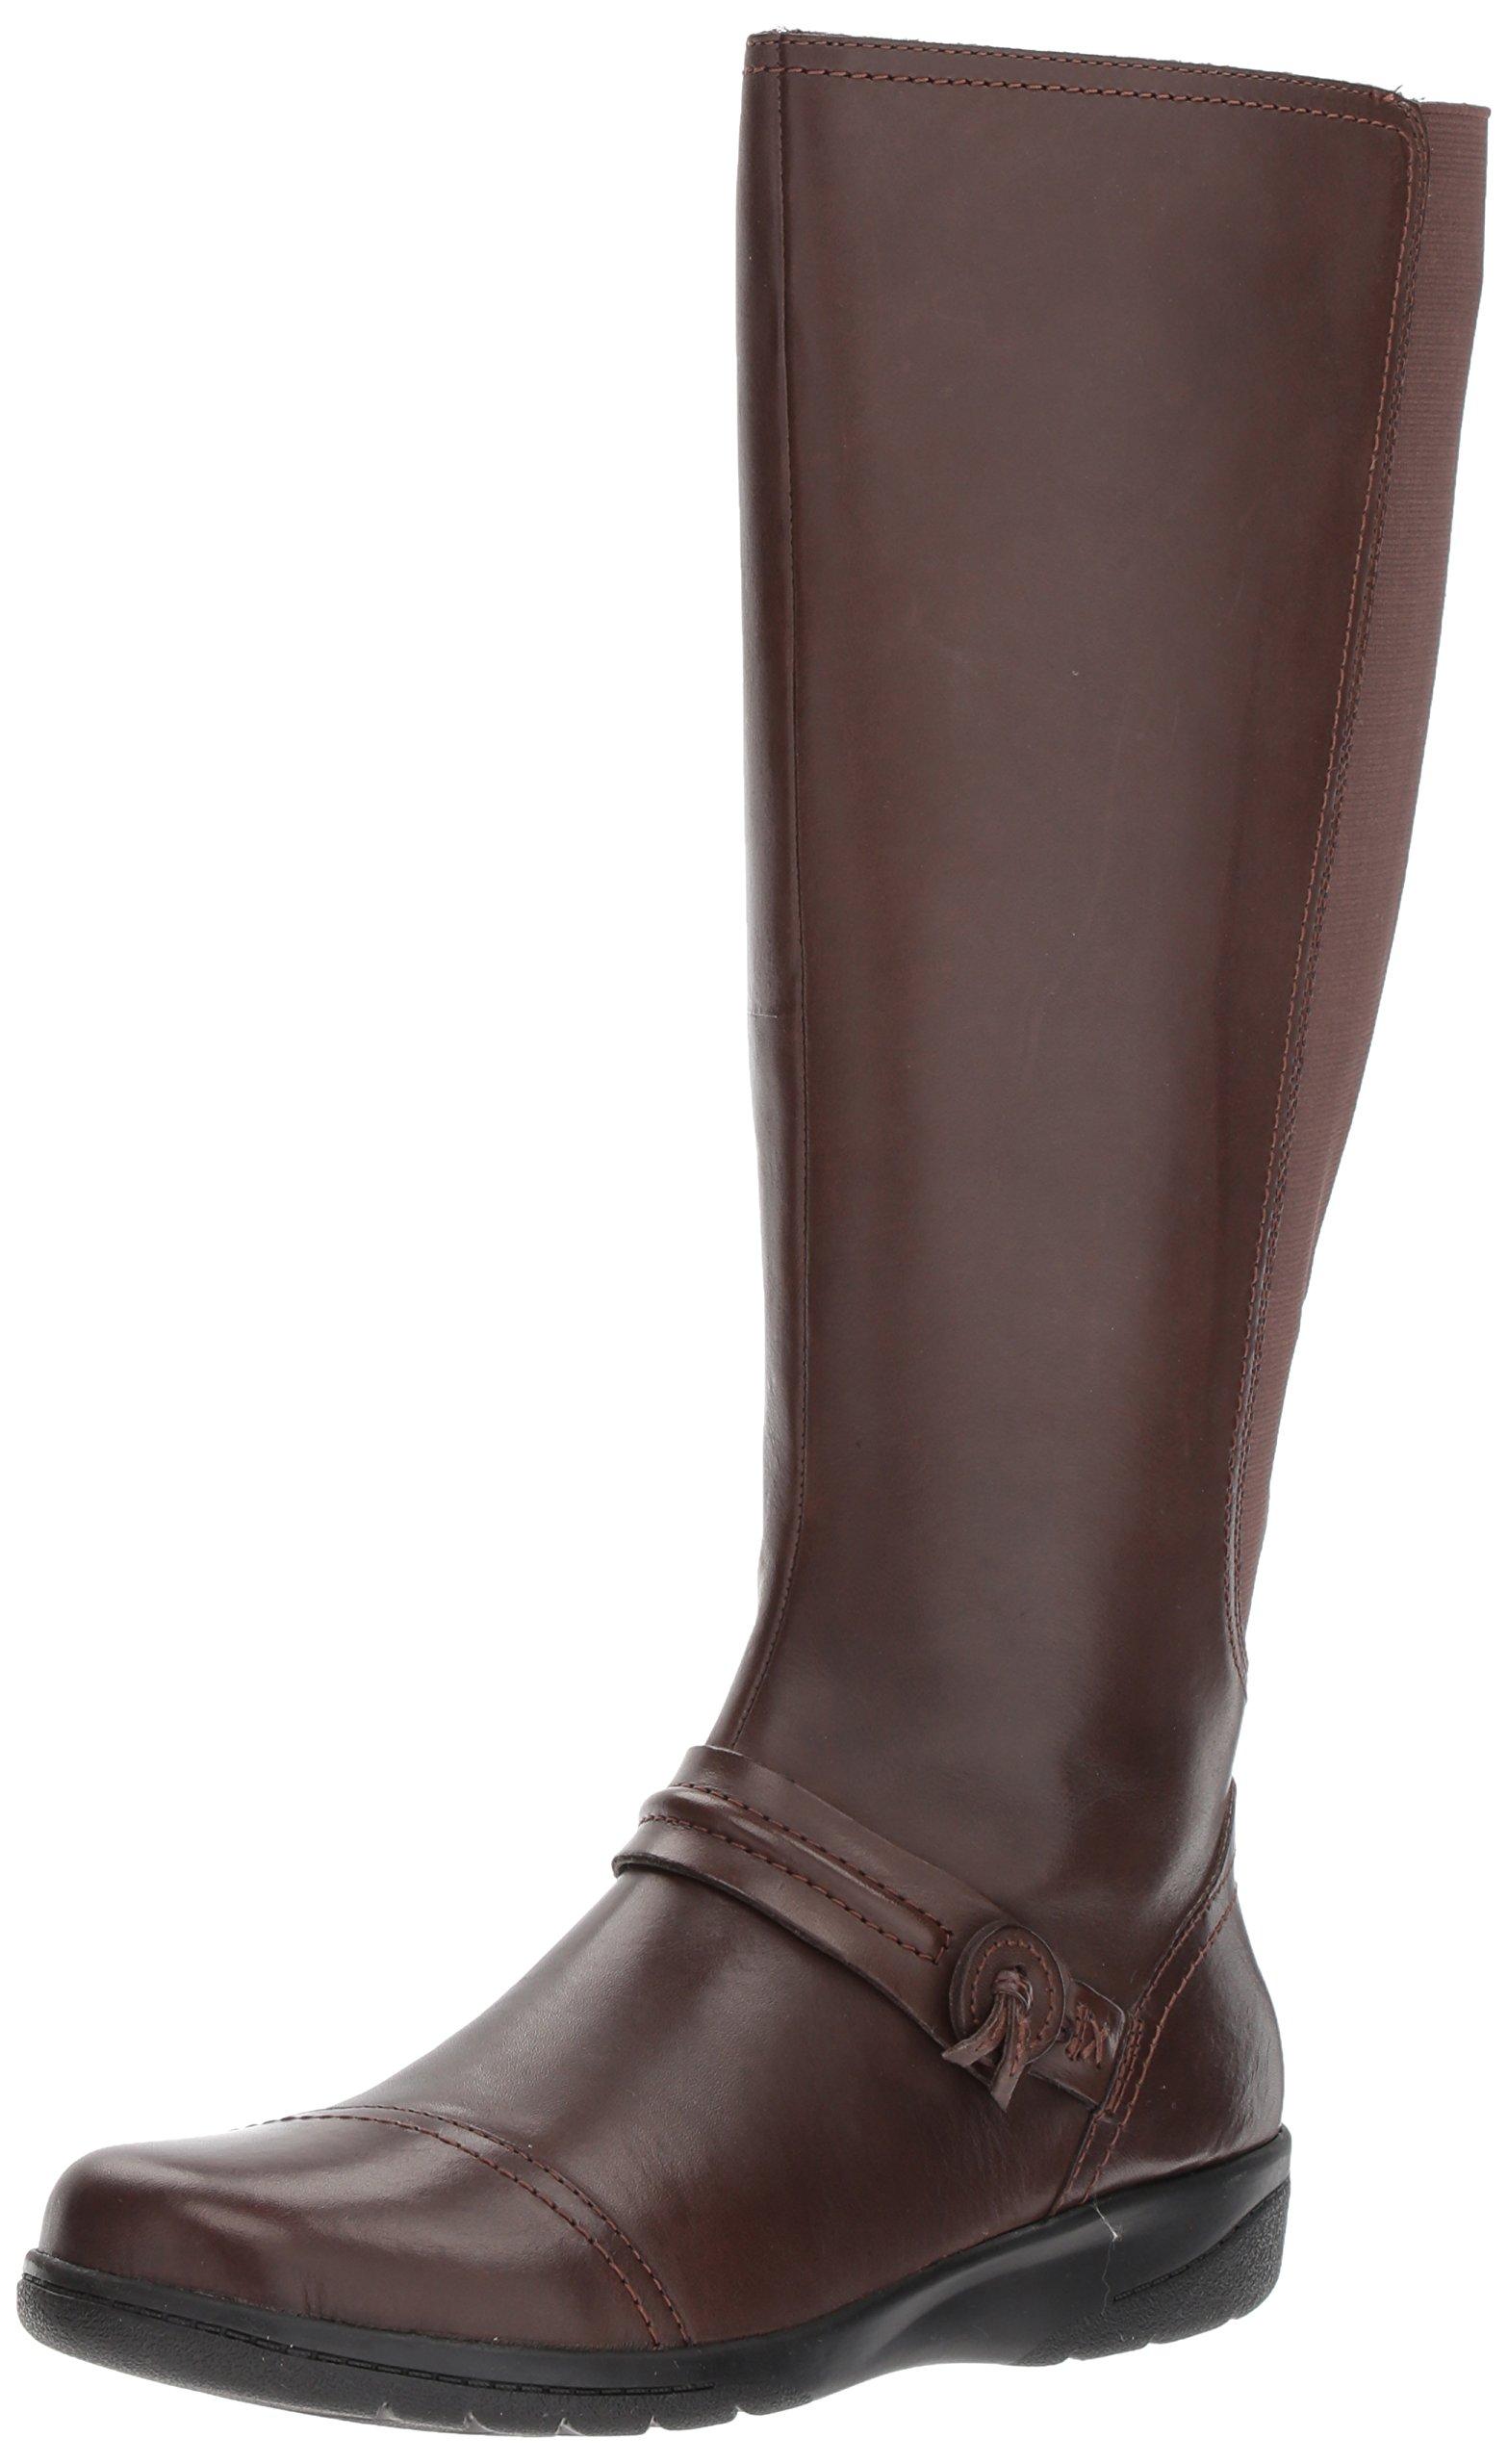 Clarks Women's Cheyn Whisk Riding Boot, Dark Brown, 8 M US